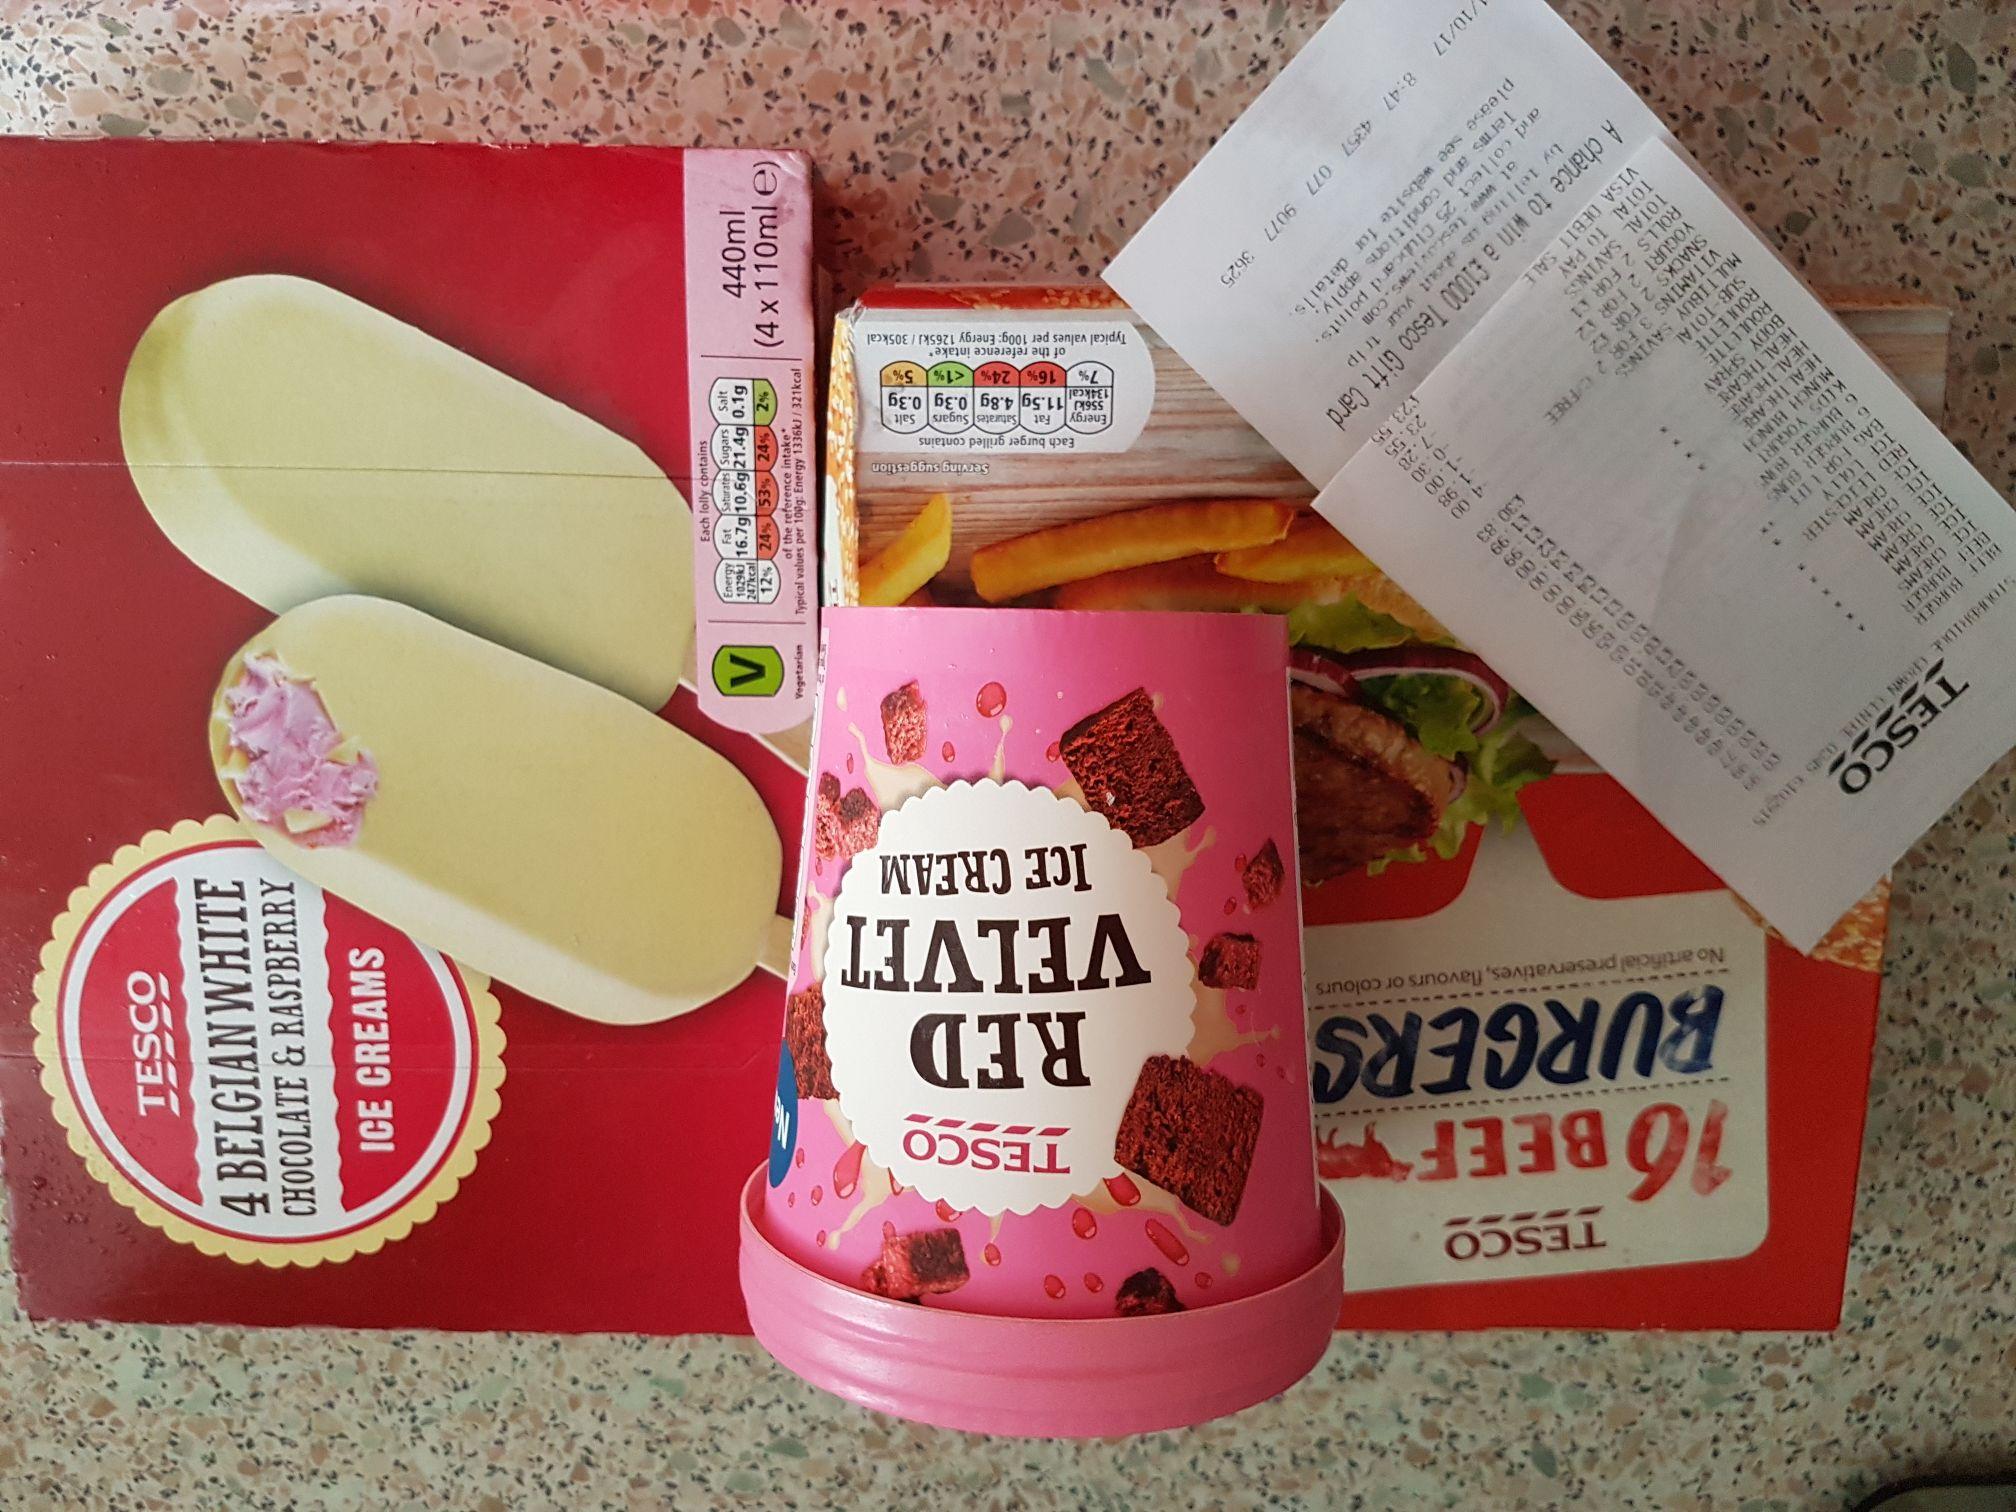 16 Beef Burgers 99p, Red Velvet Ice Cream 49p, 4 Belgium White Chocolate & Raspberry Ice Cream 77p Instore Stourbridge Tesco.